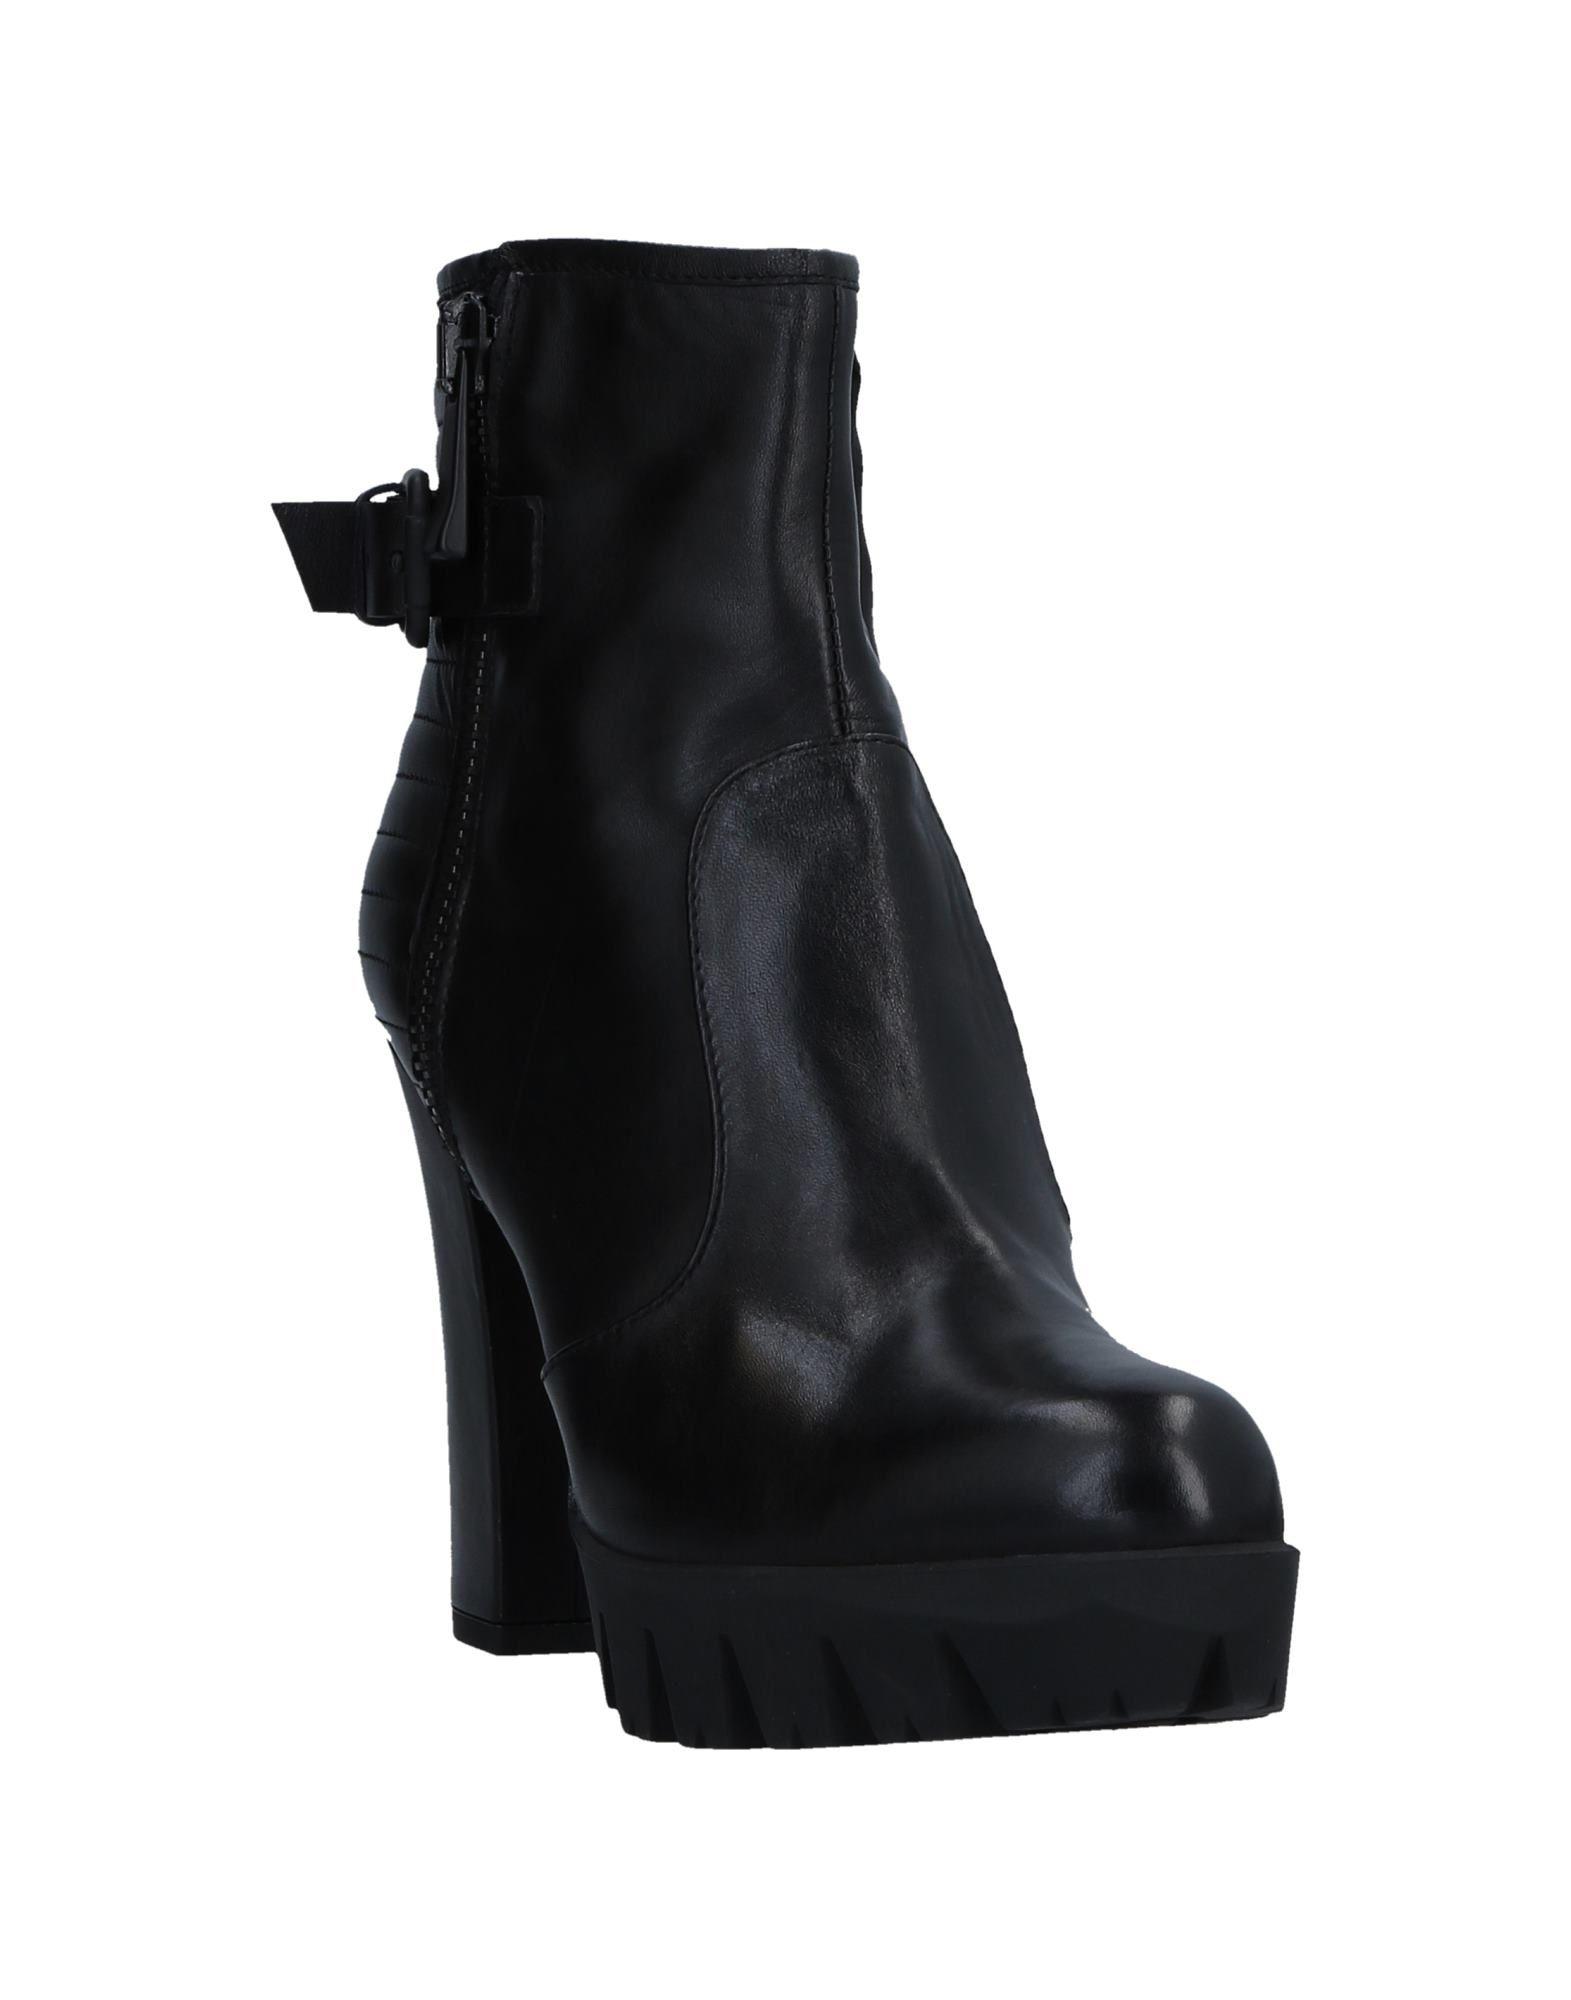 Chantal Stiefelette 11514277MG Damen  11514277MG Stiefelette Heiße Schuhe e2deb0